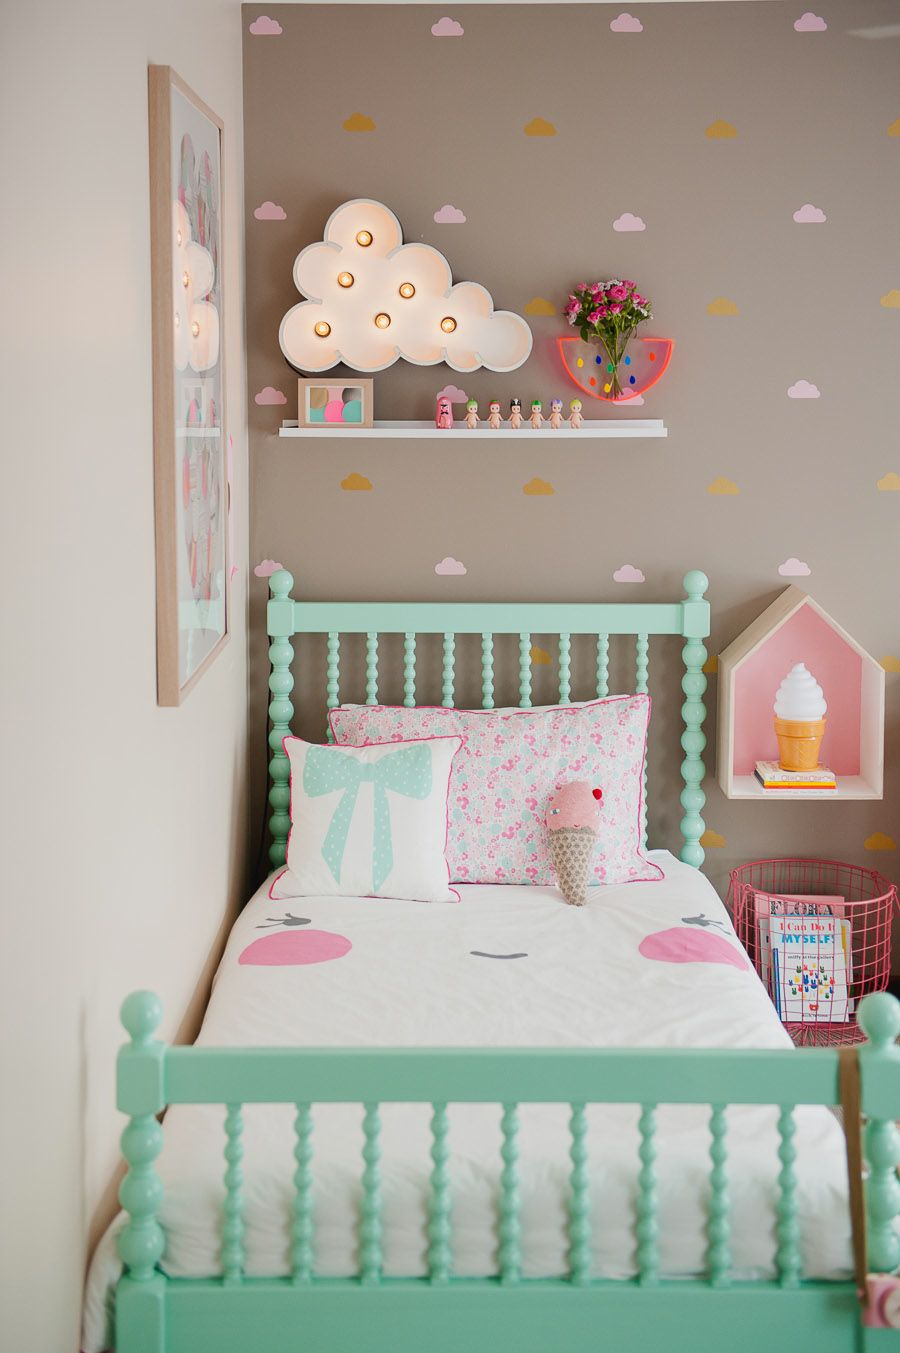 Petite Vintage Interiors X Laura Blythman 4 Kids Kinderzimmer